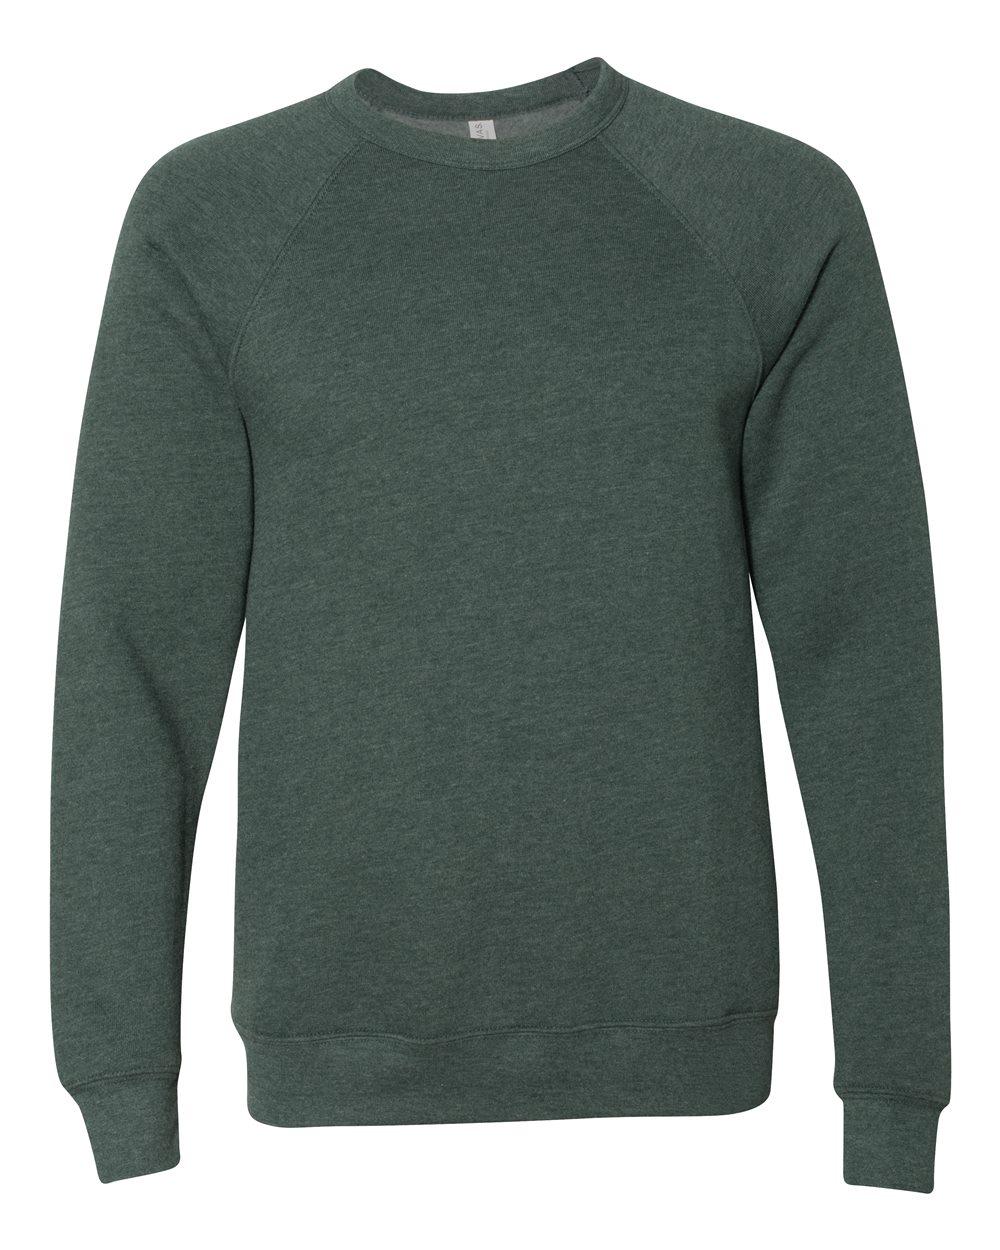 Bella-Canvas-Unisex-Sponge-Fleece-Crewneck-Sweatshirt-Top-Blank-3901-up-to-2XL thumbnail 35